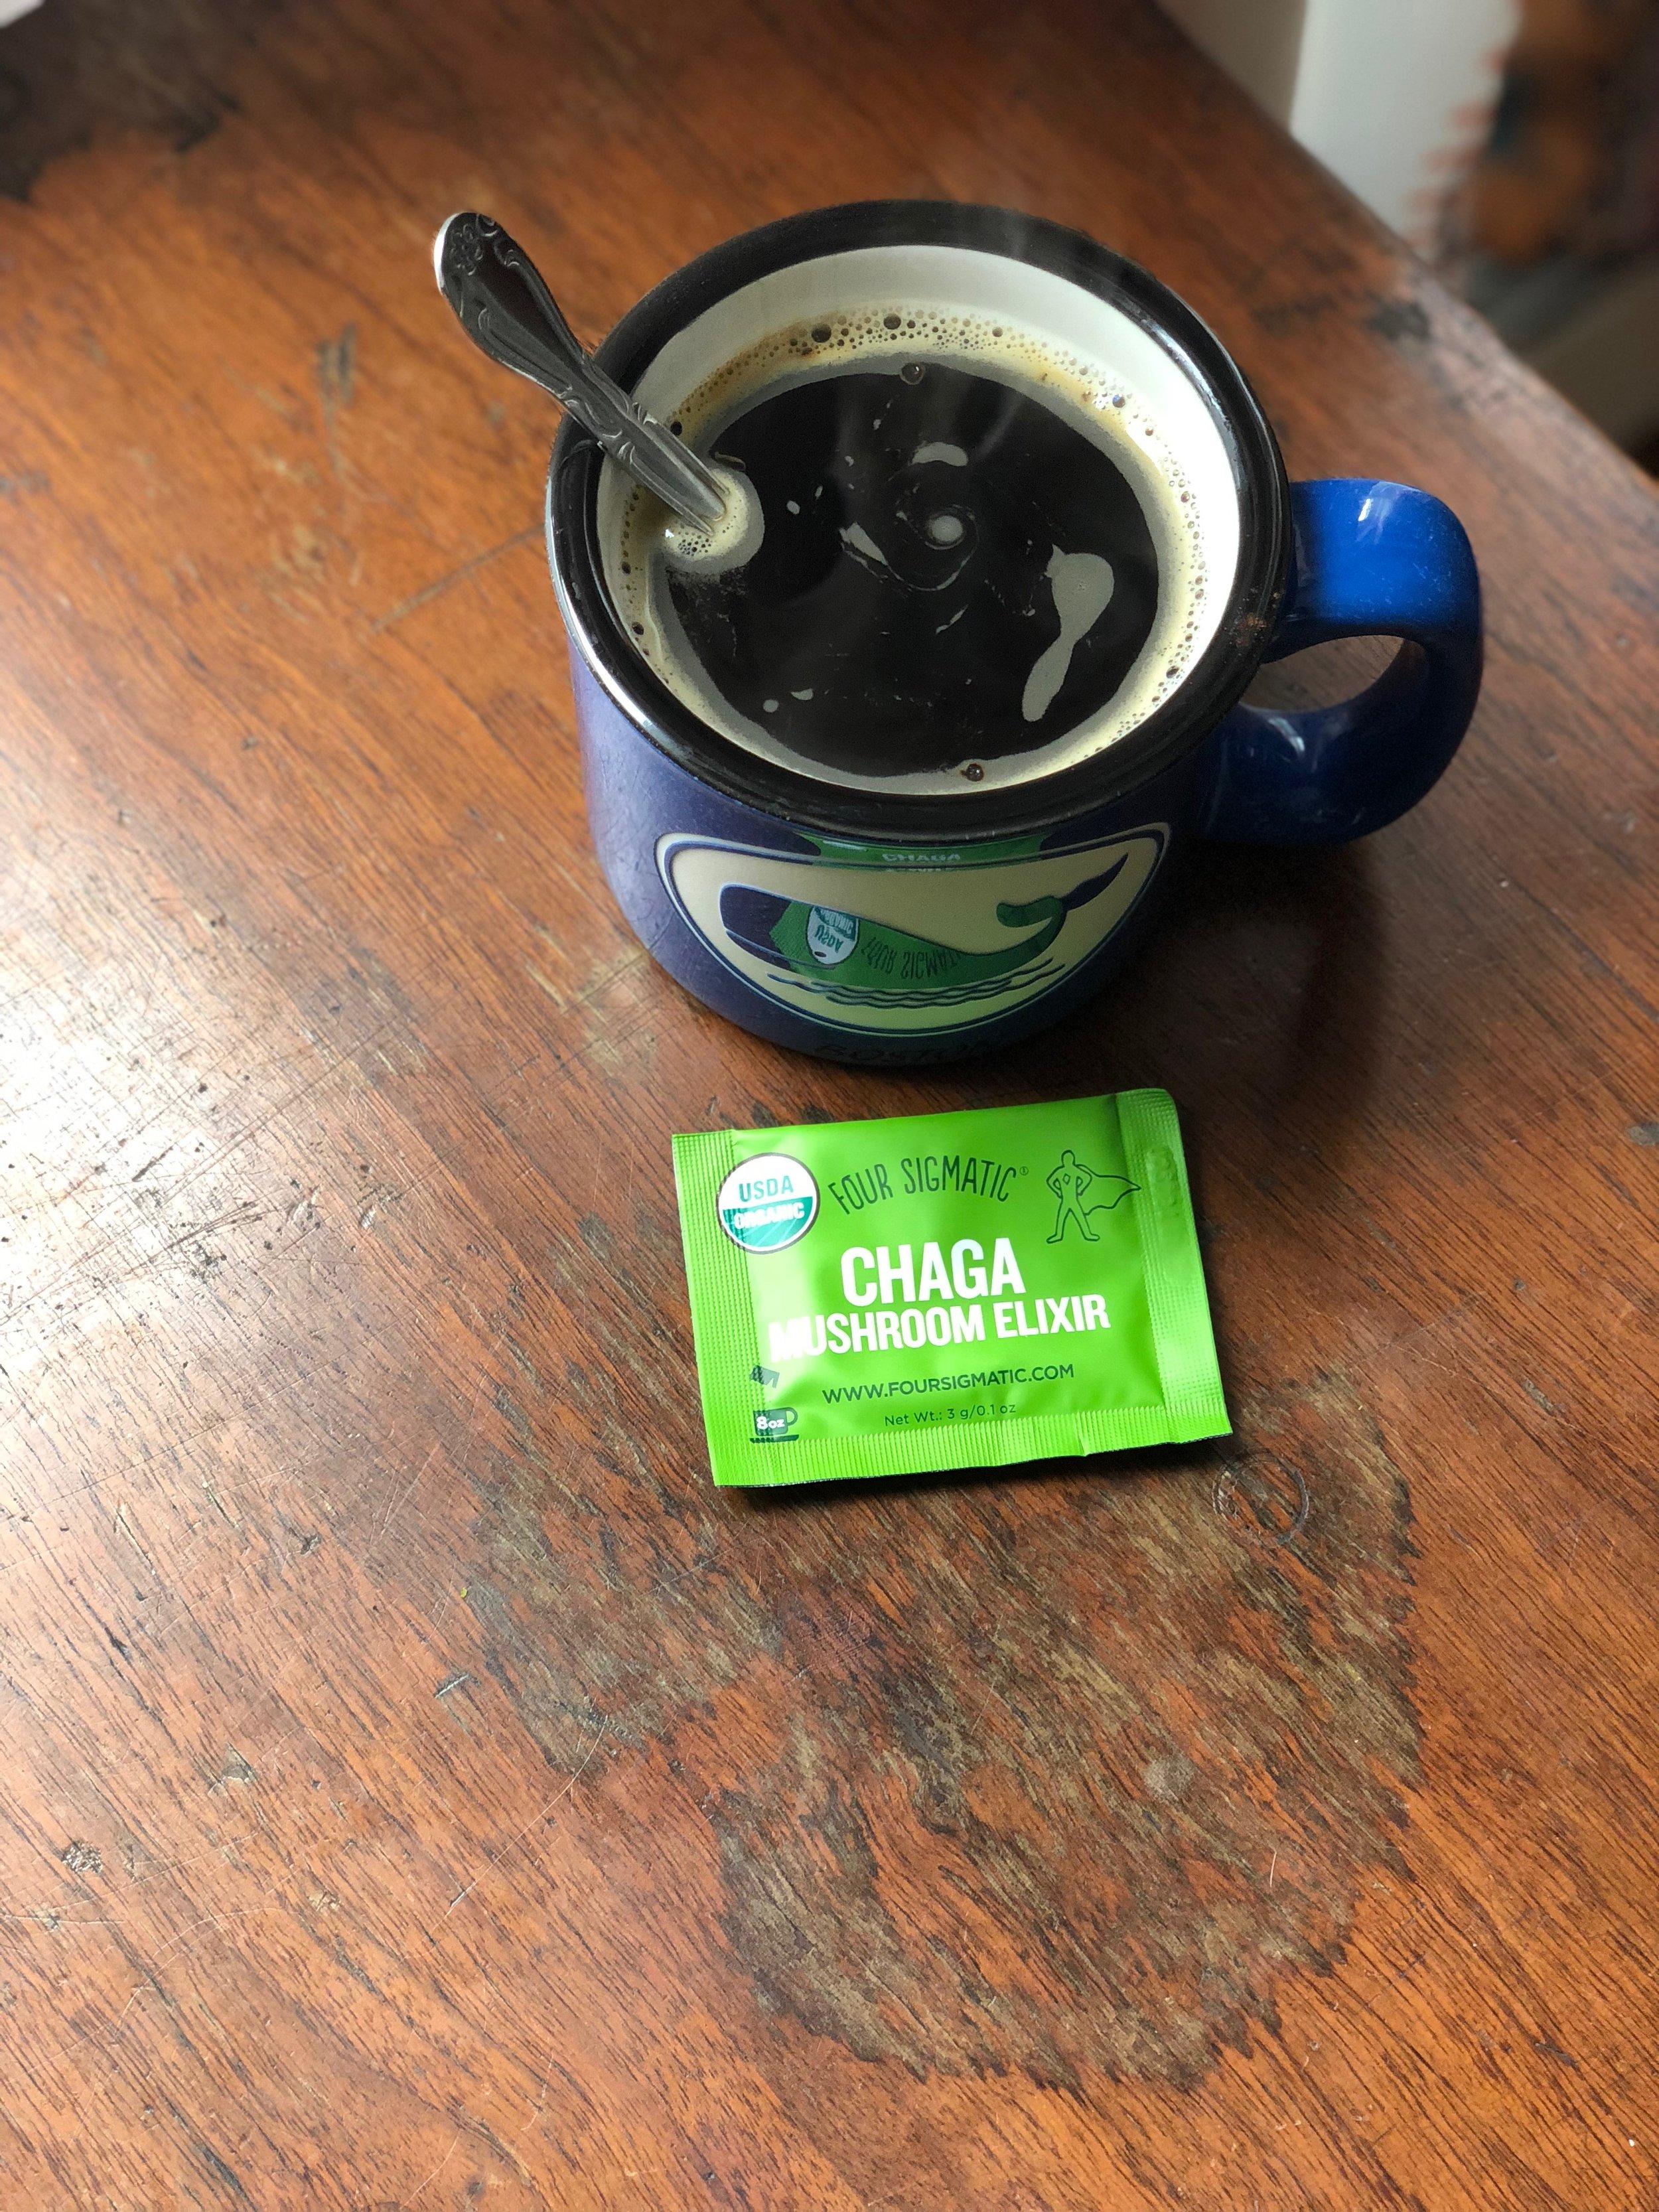 Four Sigmatic:  Chaga Mushroom Elixir Mix